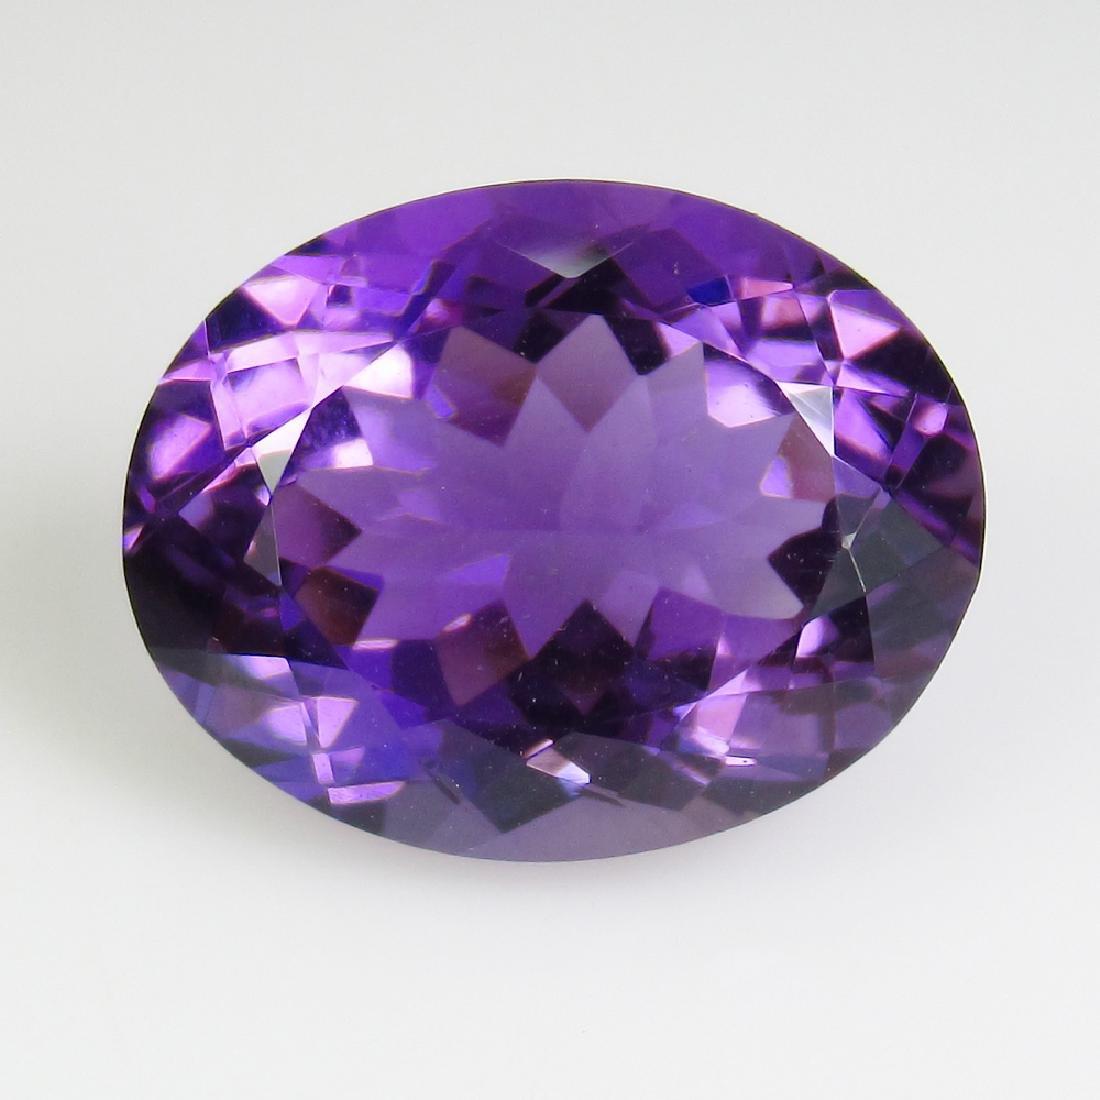 9.59 Ctw Natural Purple Amethyst Nice Oval Cut